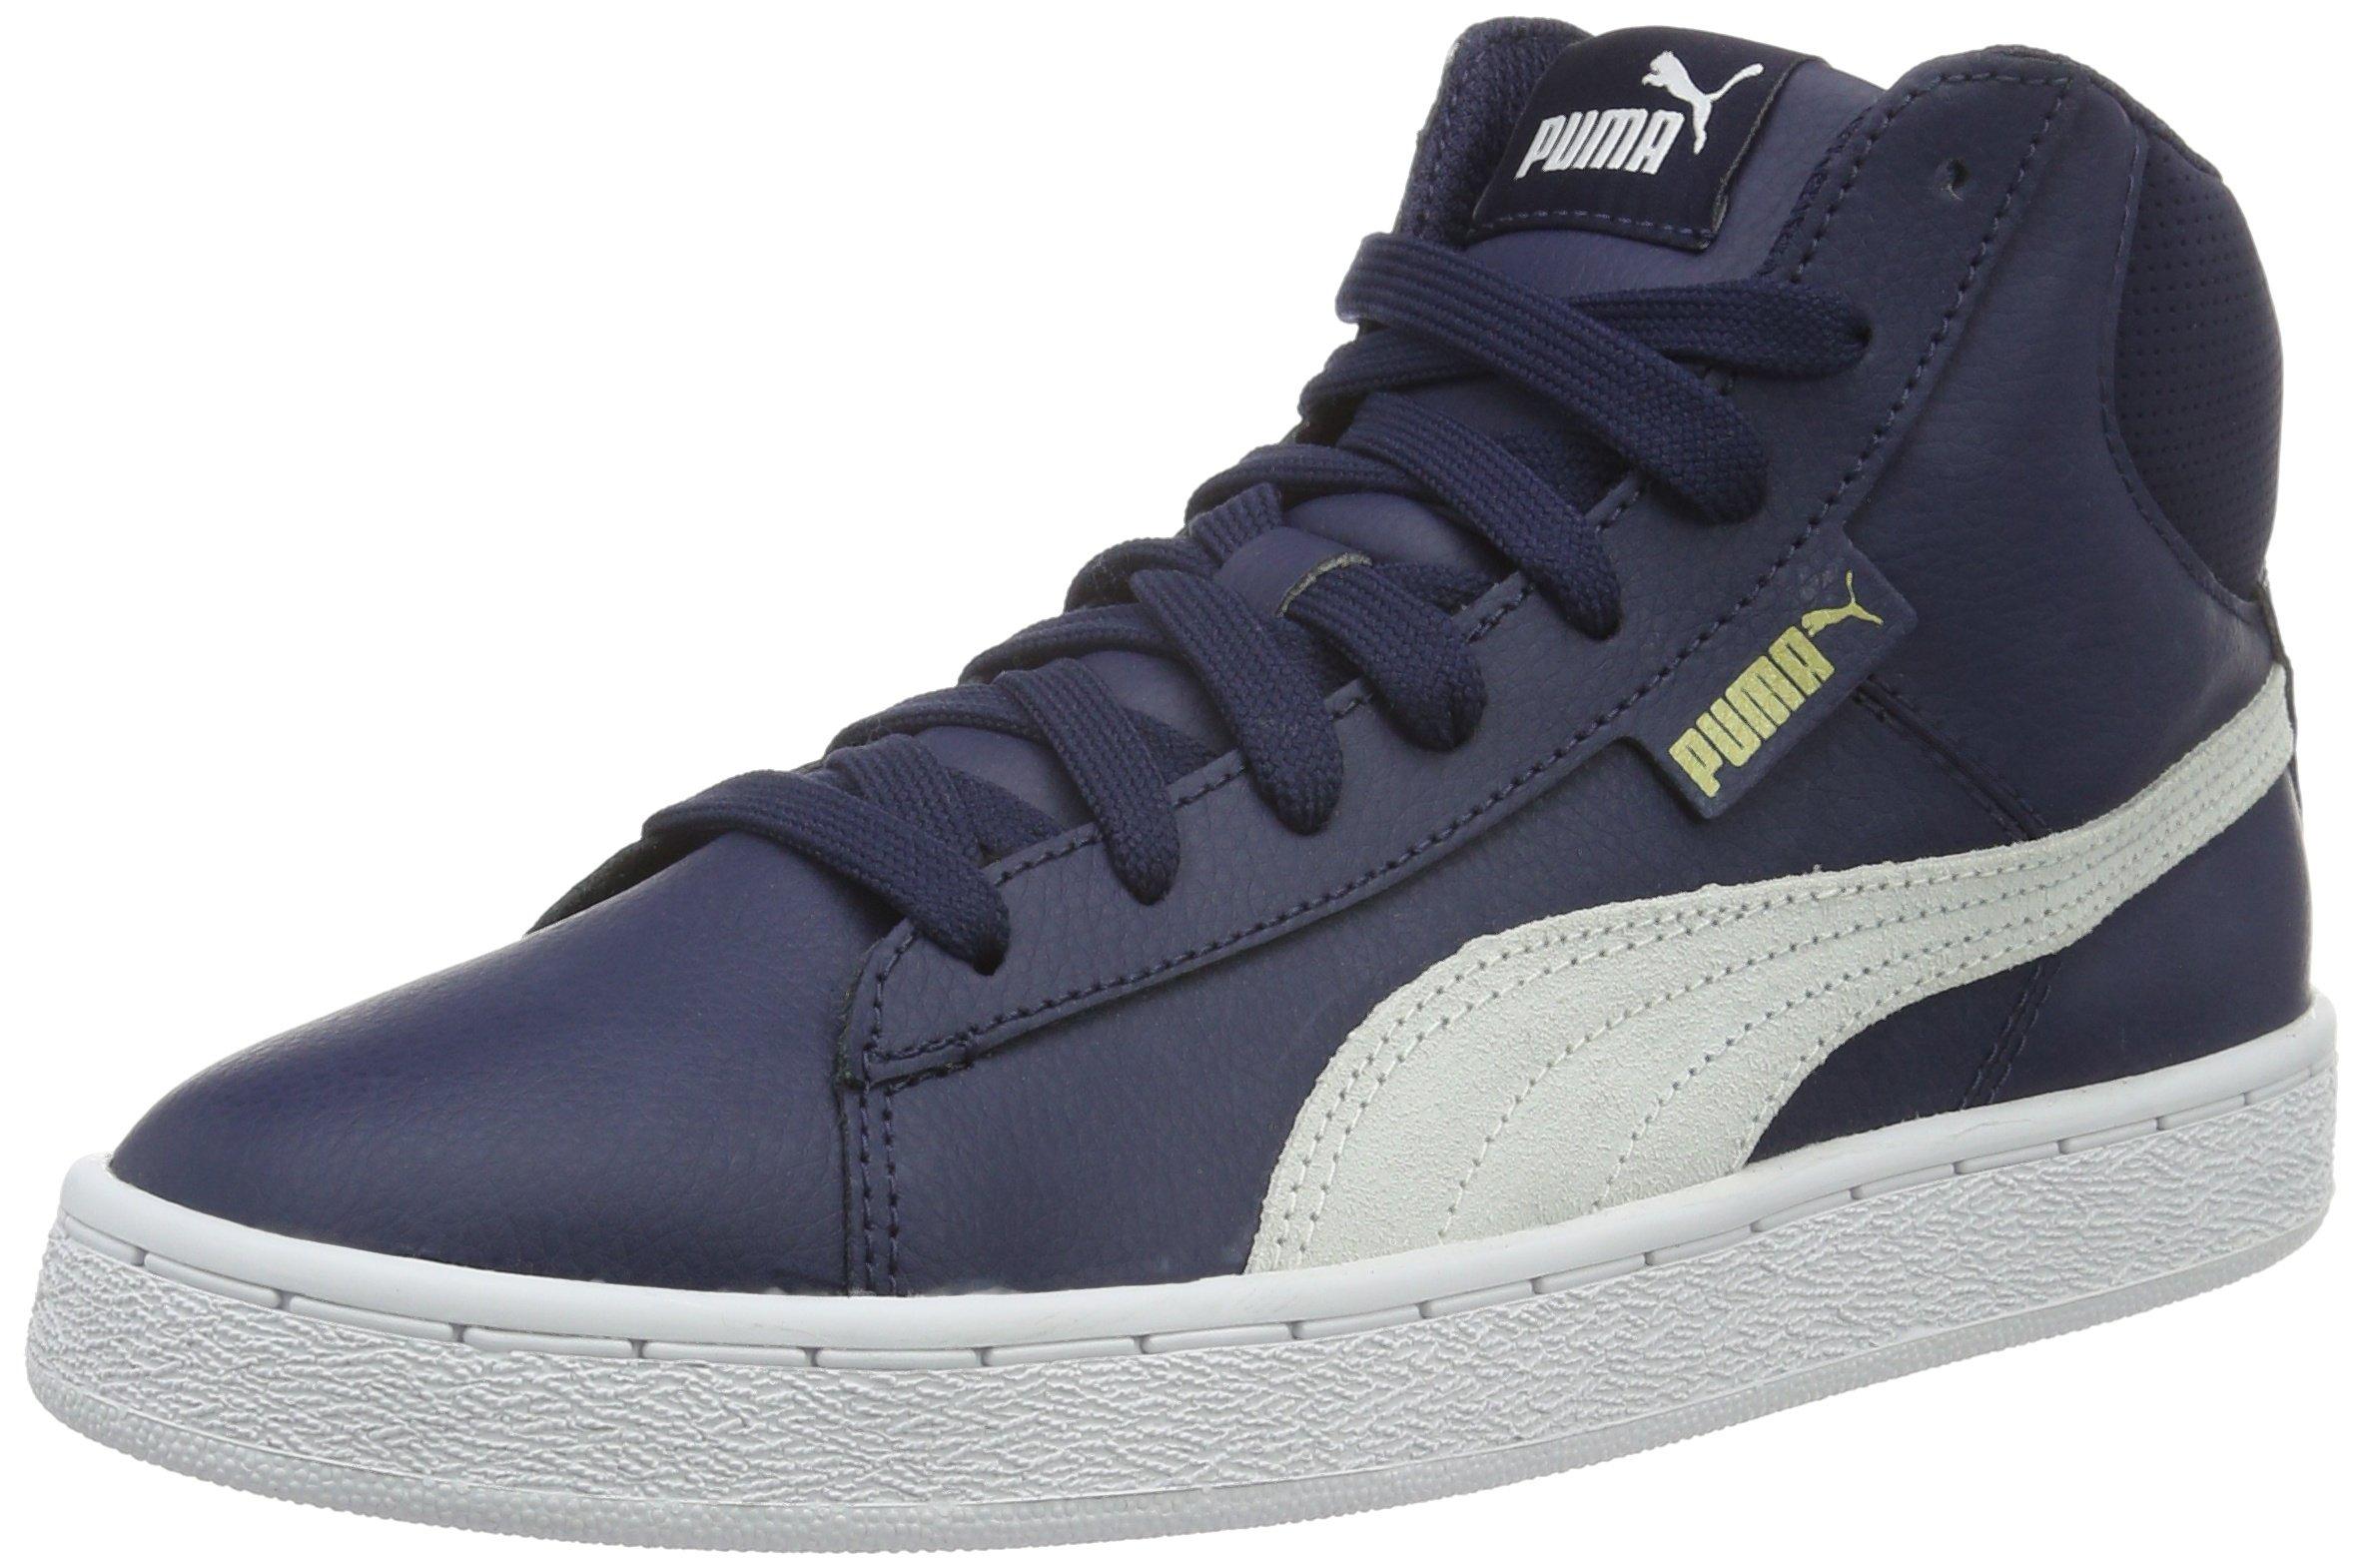 PUMA 1948 Mid L, Unisex Adults' Low-Top Sneakers, Blau (Peacoat White 04), 5.5 UK